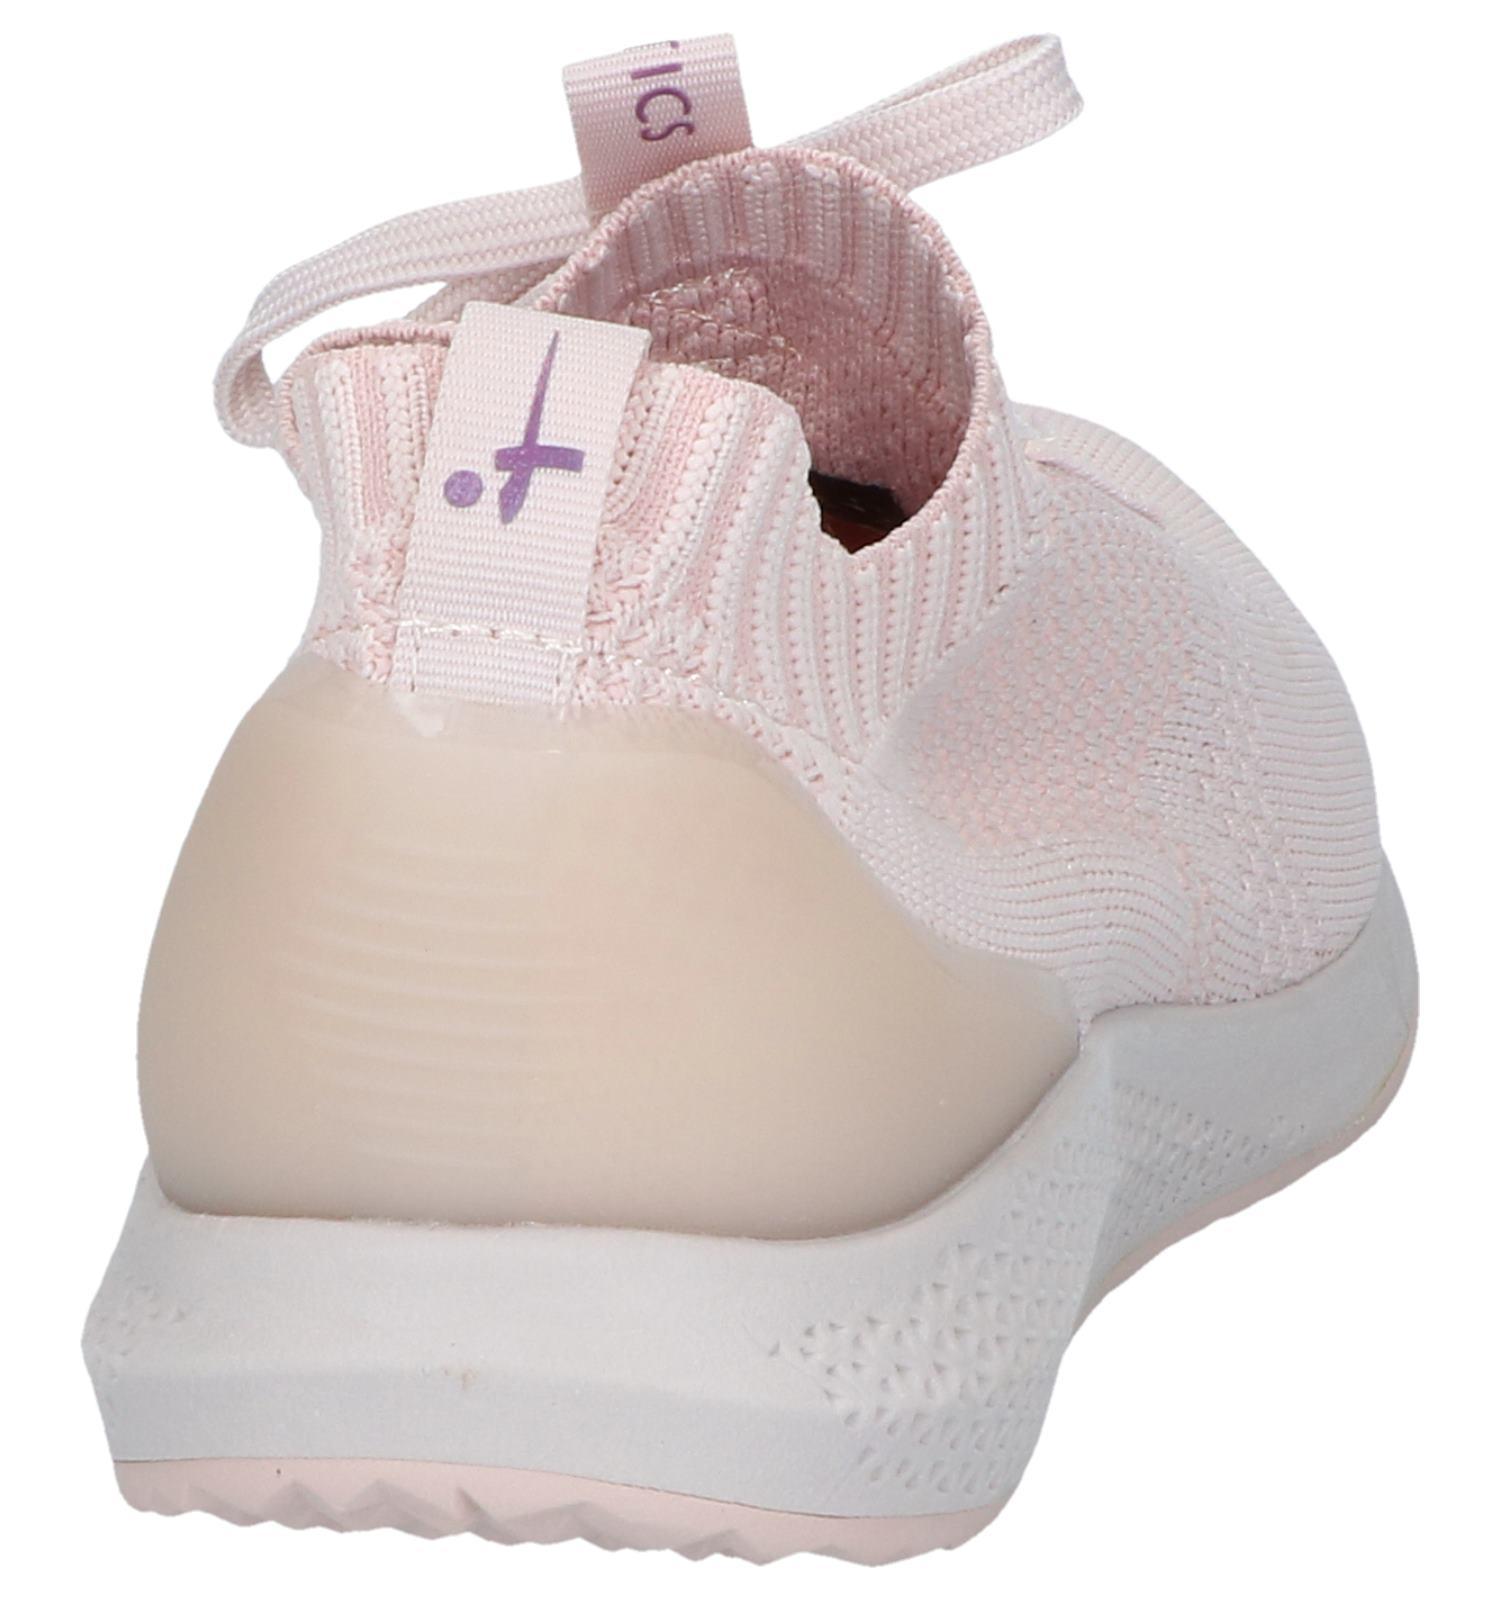 Sneakers Tamaris Fashletics Roze Slip on LUqMpGSzV